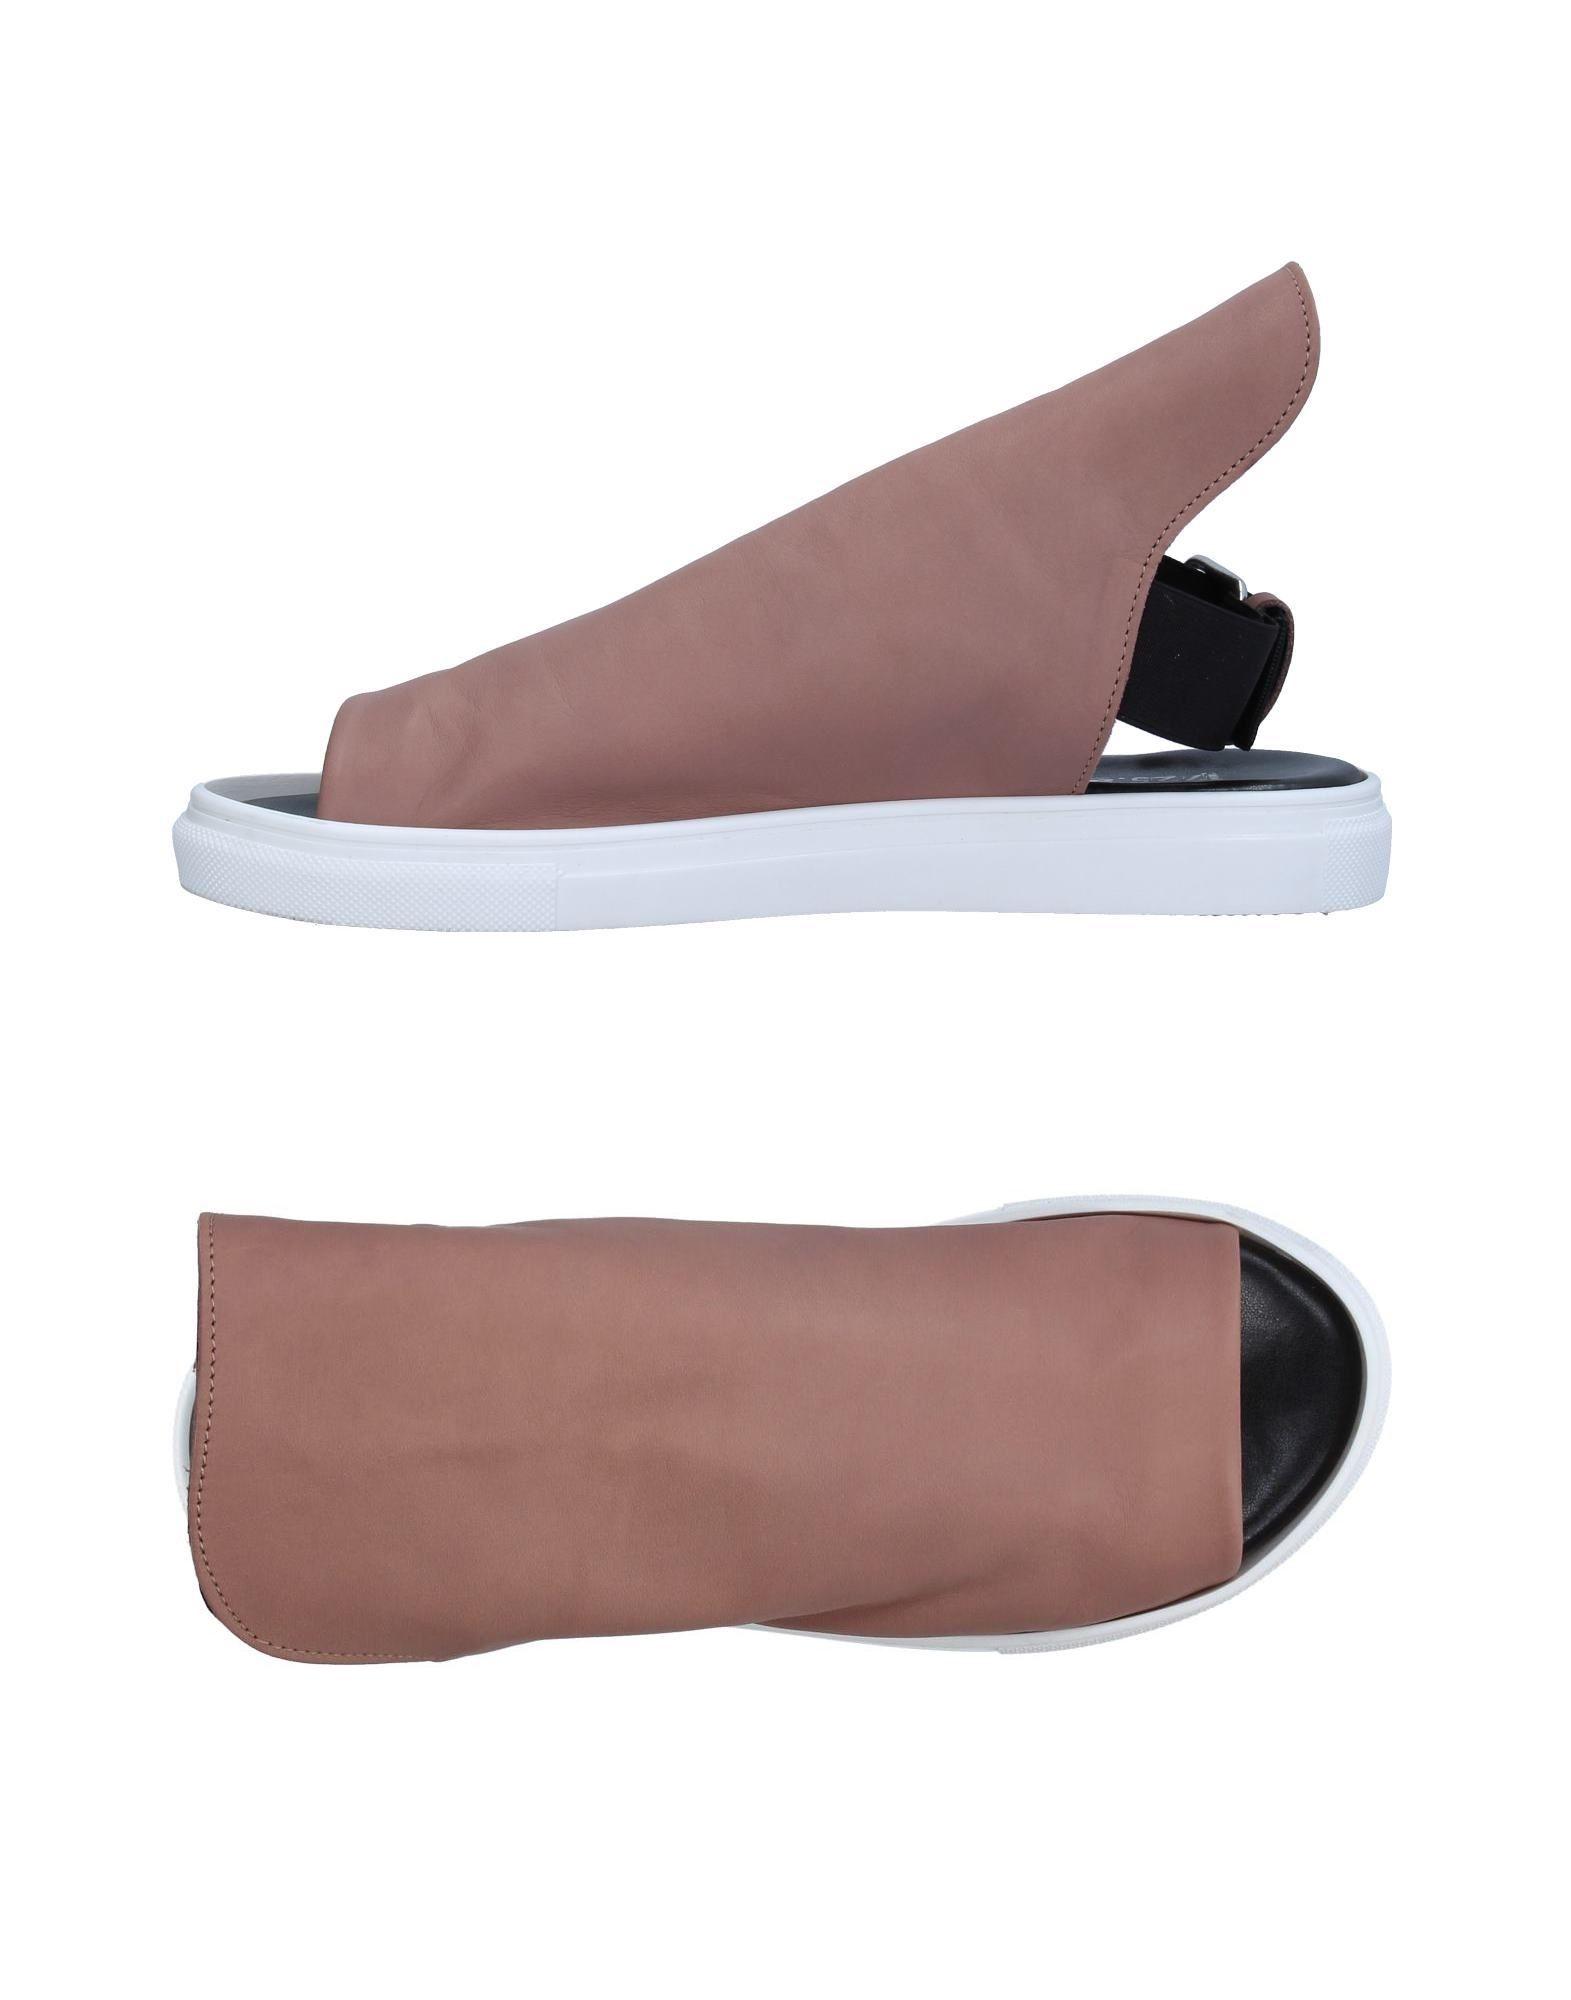 1725.A Damen Sandale Farbe Nude Größe 3 jetztbilligerkaufen